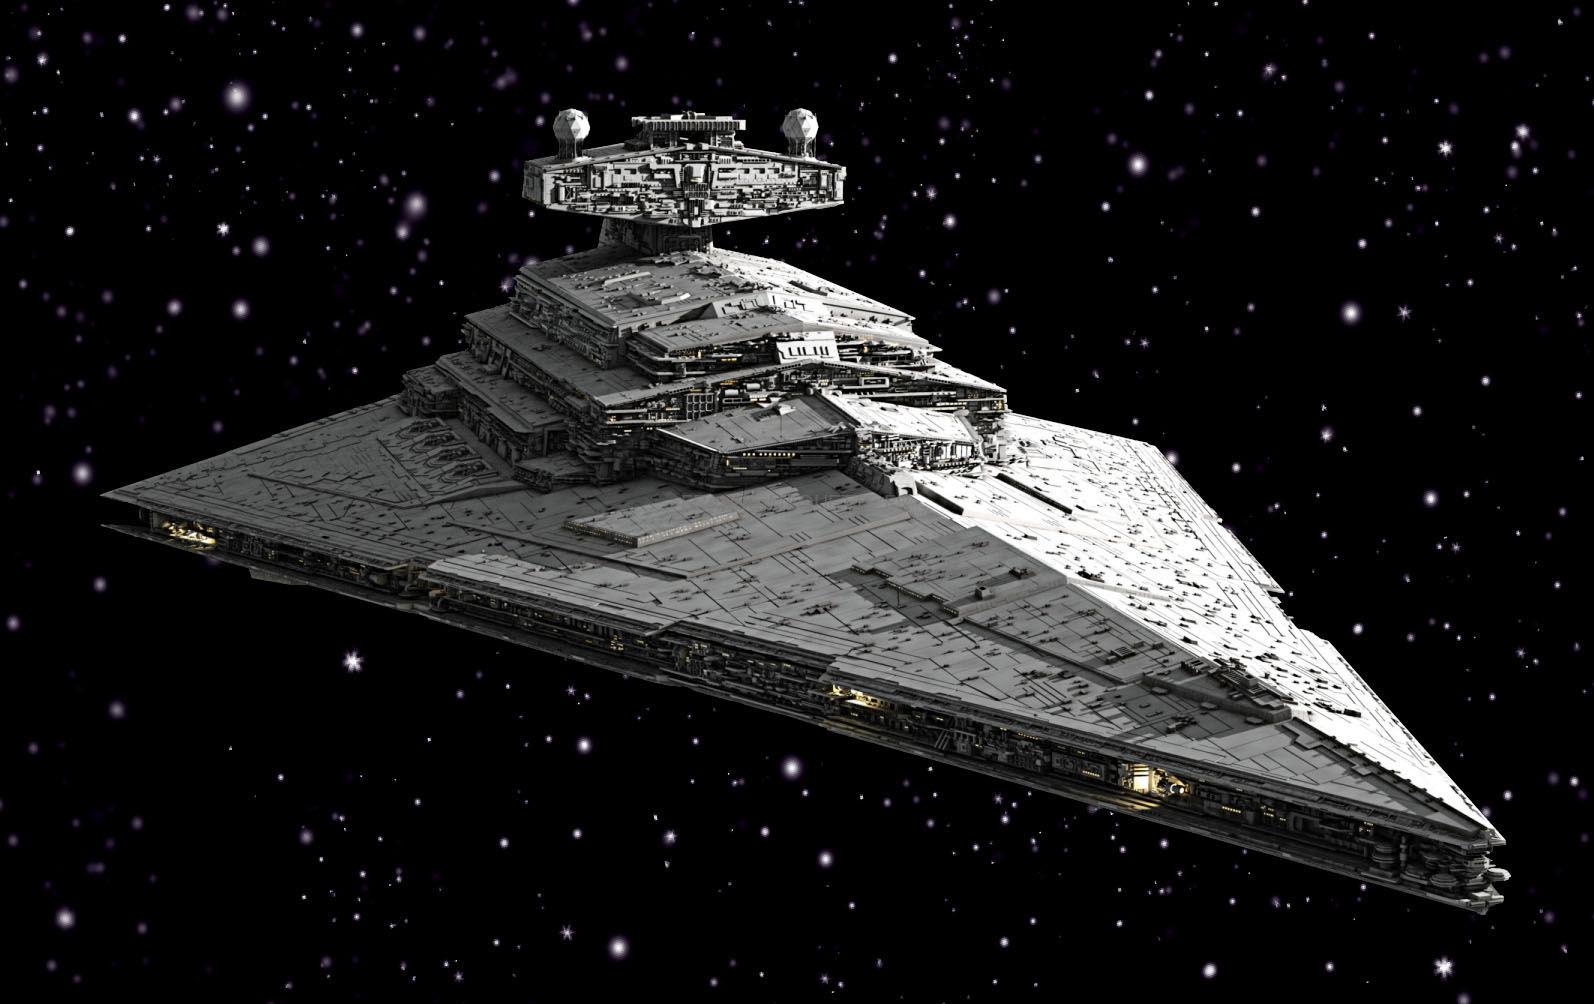 Maquette star wars destroyer stellaire revell 03609 - Vaisseau de dark vador ...